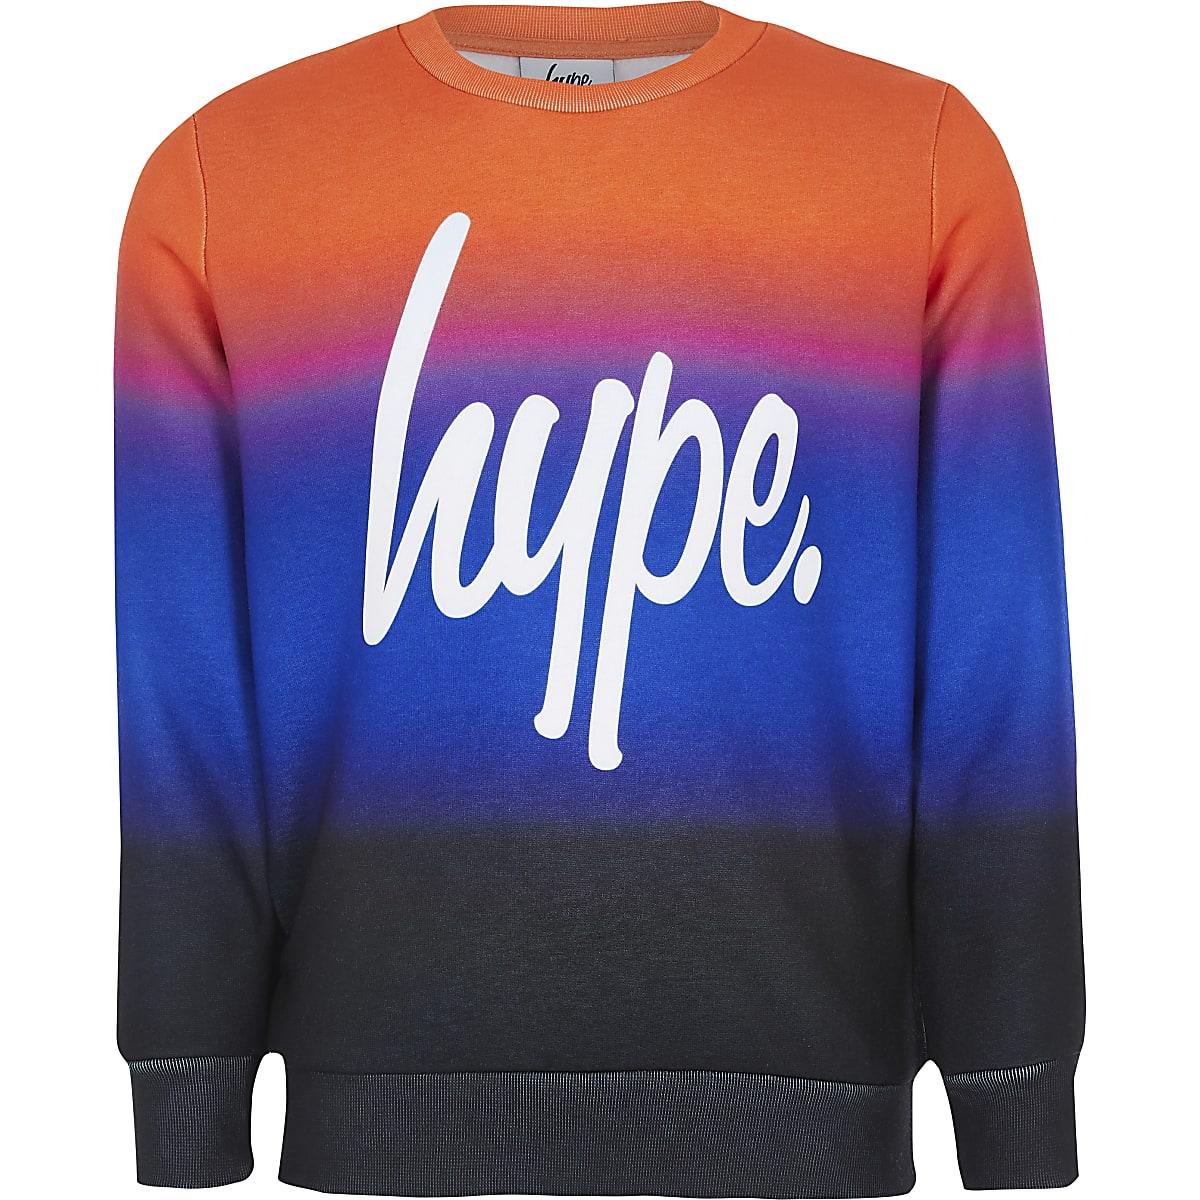 Boys Hype orange printed sweatshirt